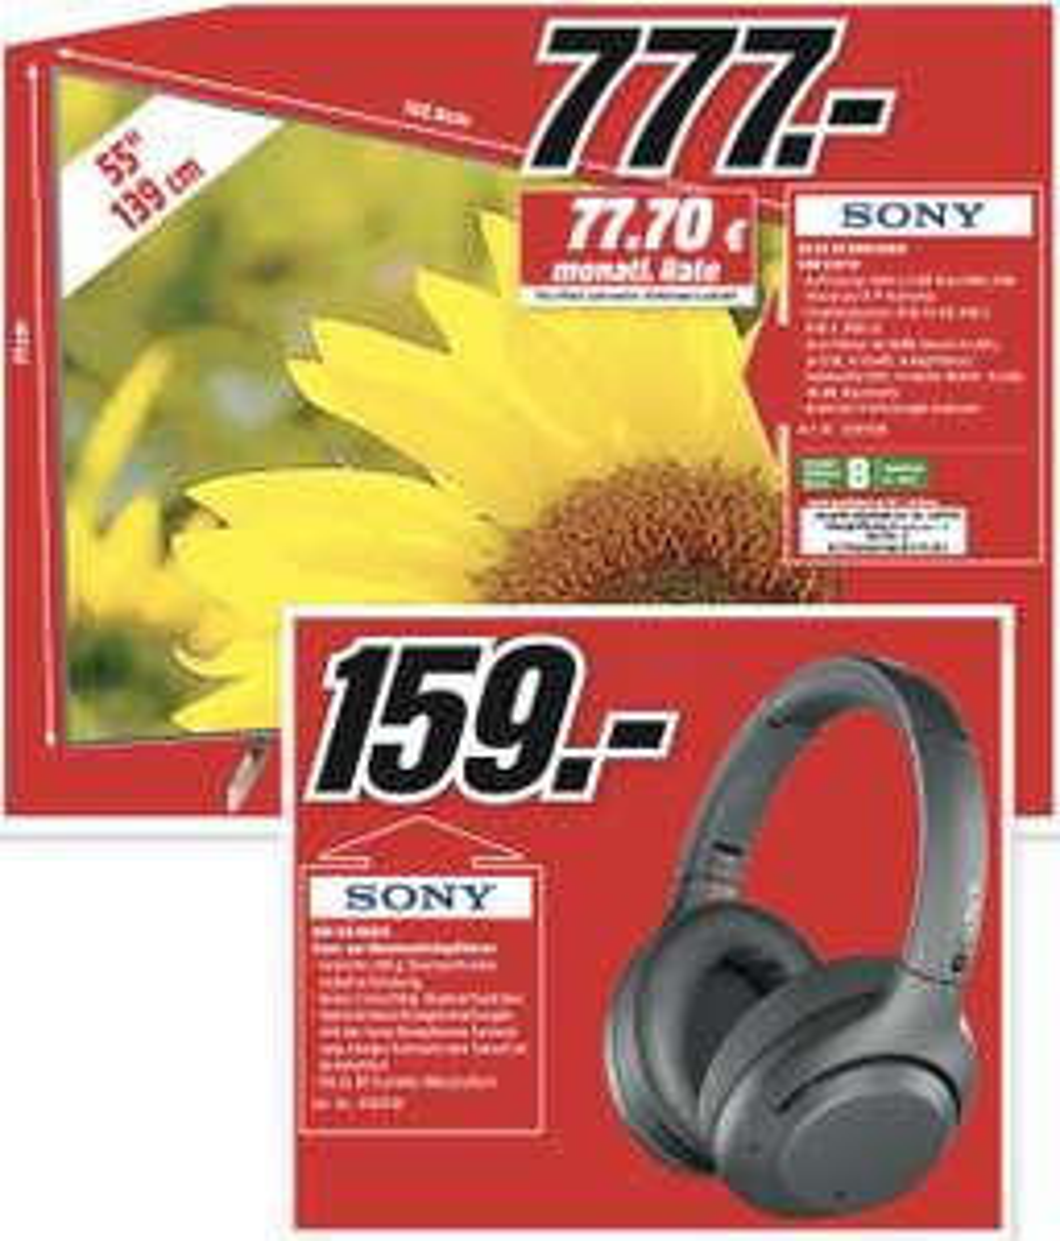 Lokal MediaMarkt Frankfurt-NWZ: Sony KD-55XF9005 139cm 4K UHD TV für 777€ oder Sony WH-XB900N NEUHEIT Noise Cancelling Kopfhörer für 159€